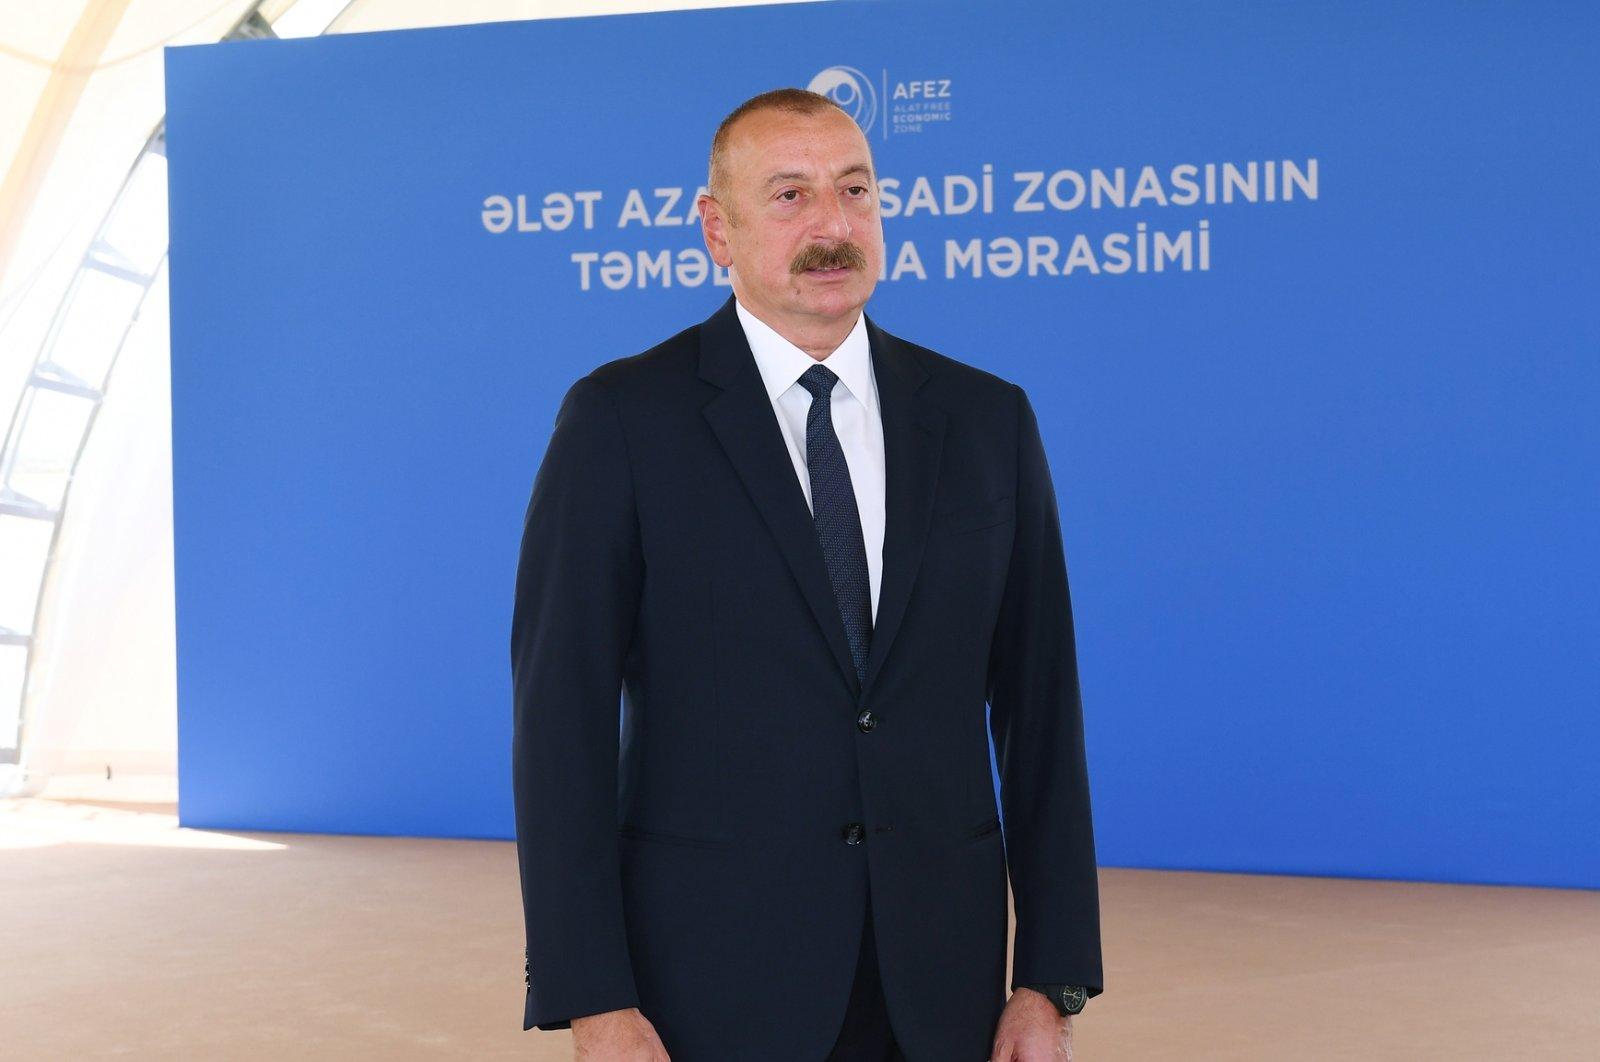 Azerbaijan's President Ilham Aliyev is seen during the groundbreaking of a free trade zone in Alat, Azerbaijan, July 1, 2021 (AA Photo)